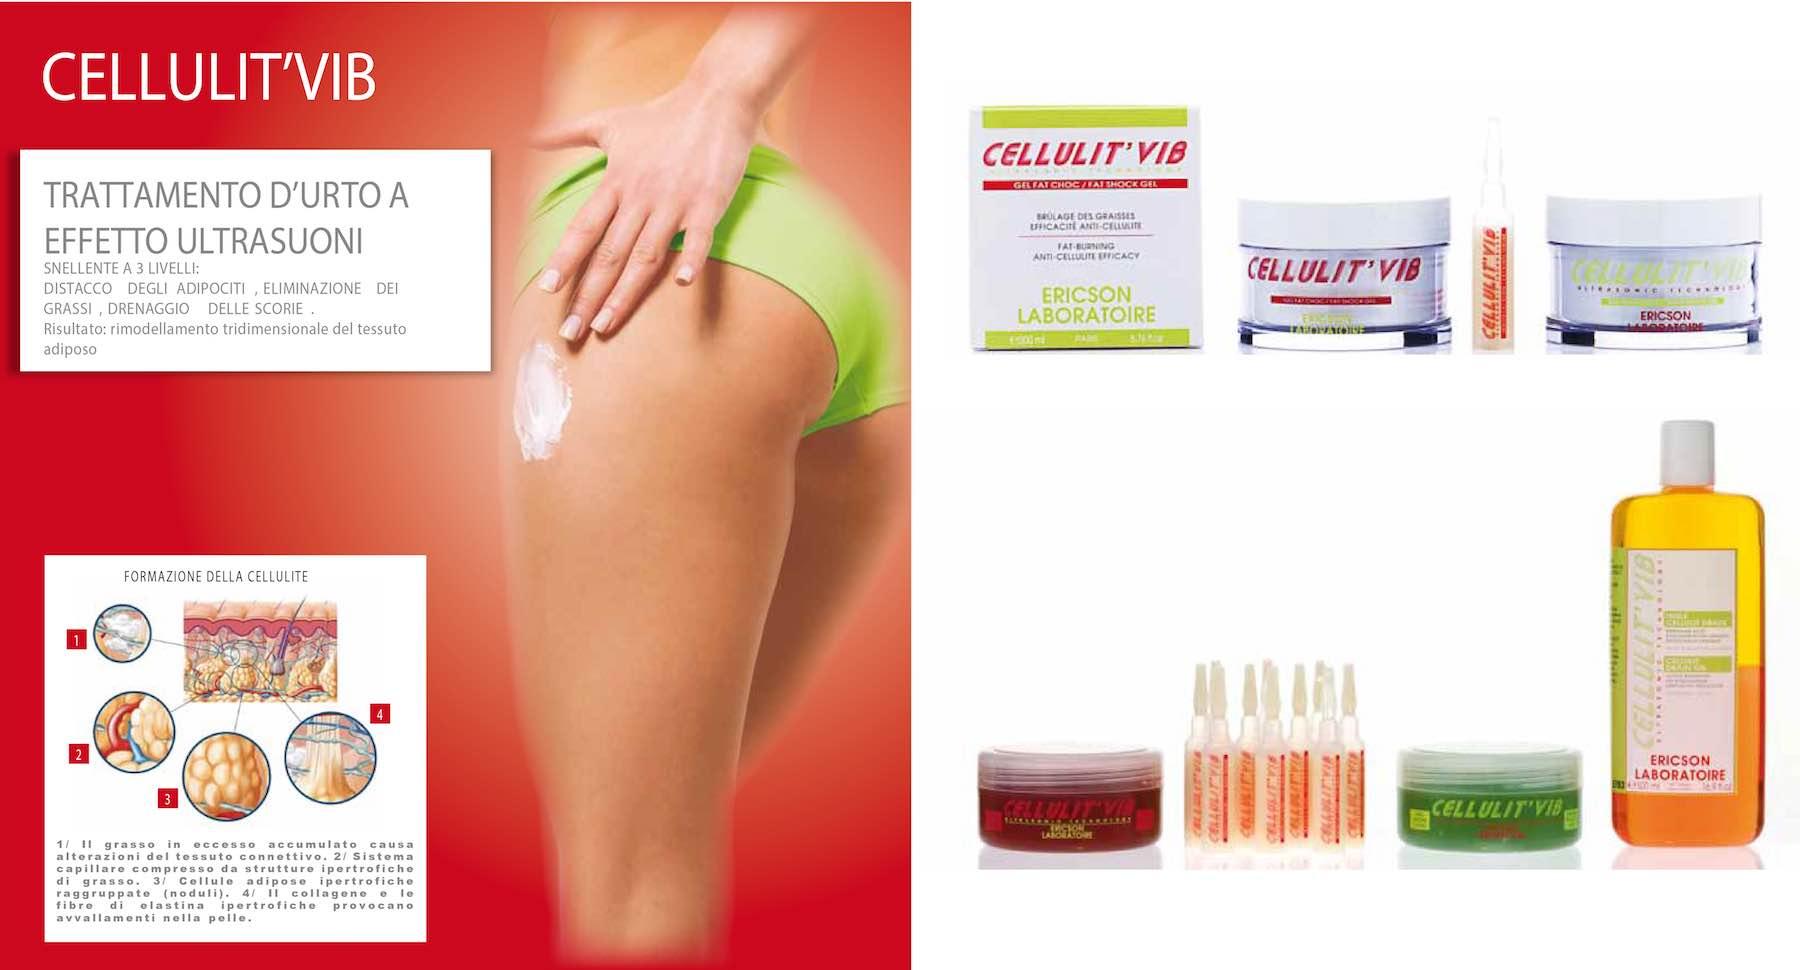 Jerà Beauty - Body - Ericson - Laboratoire-cellulit'vib